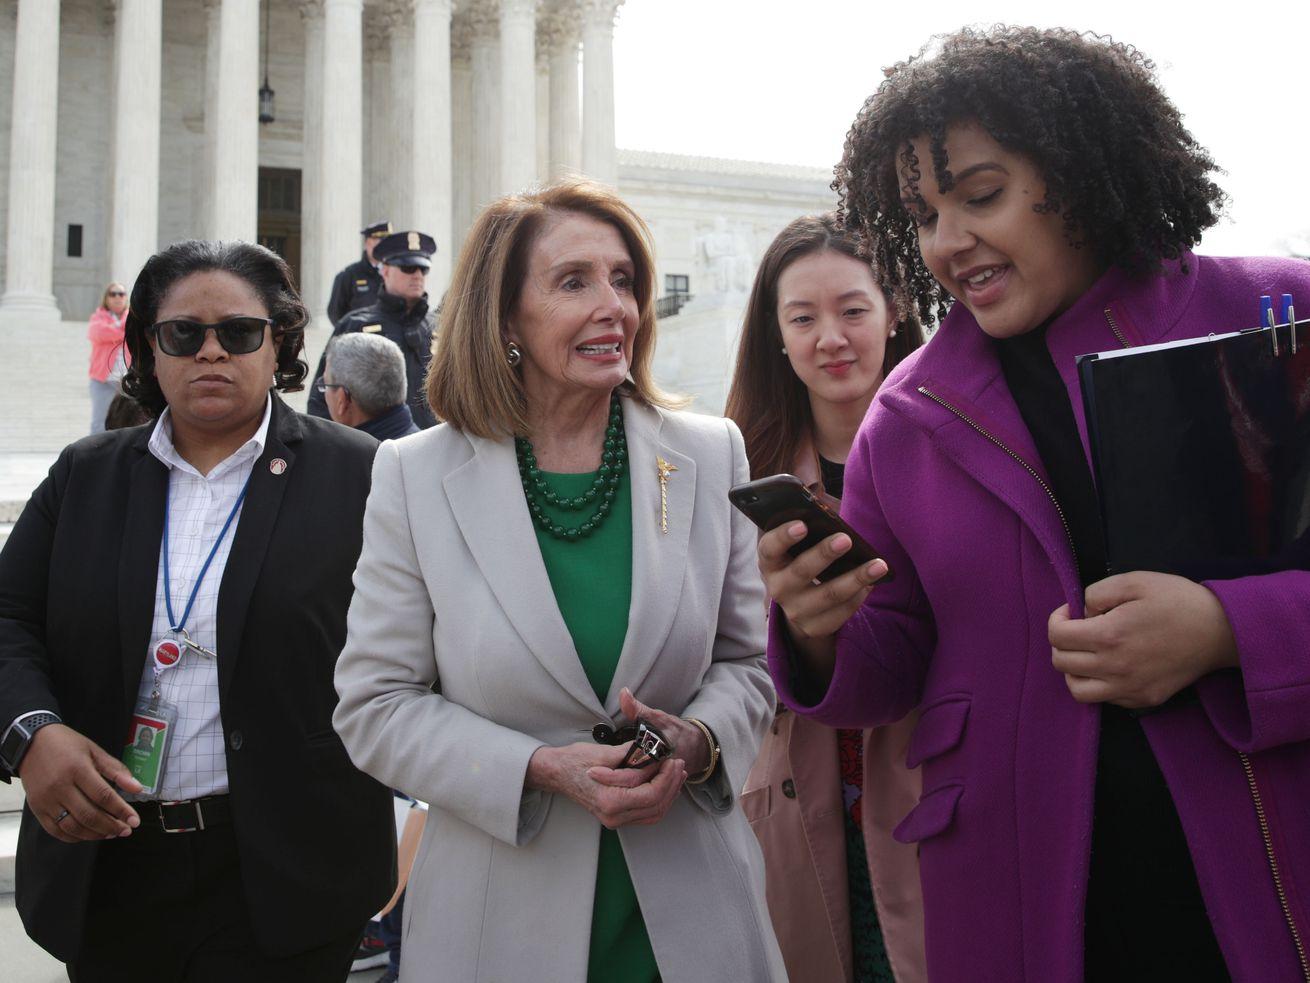 U.S. Speaker of the House Rep. Nancy Pelosi (D-CA)outside the U.S. Supreme Court.